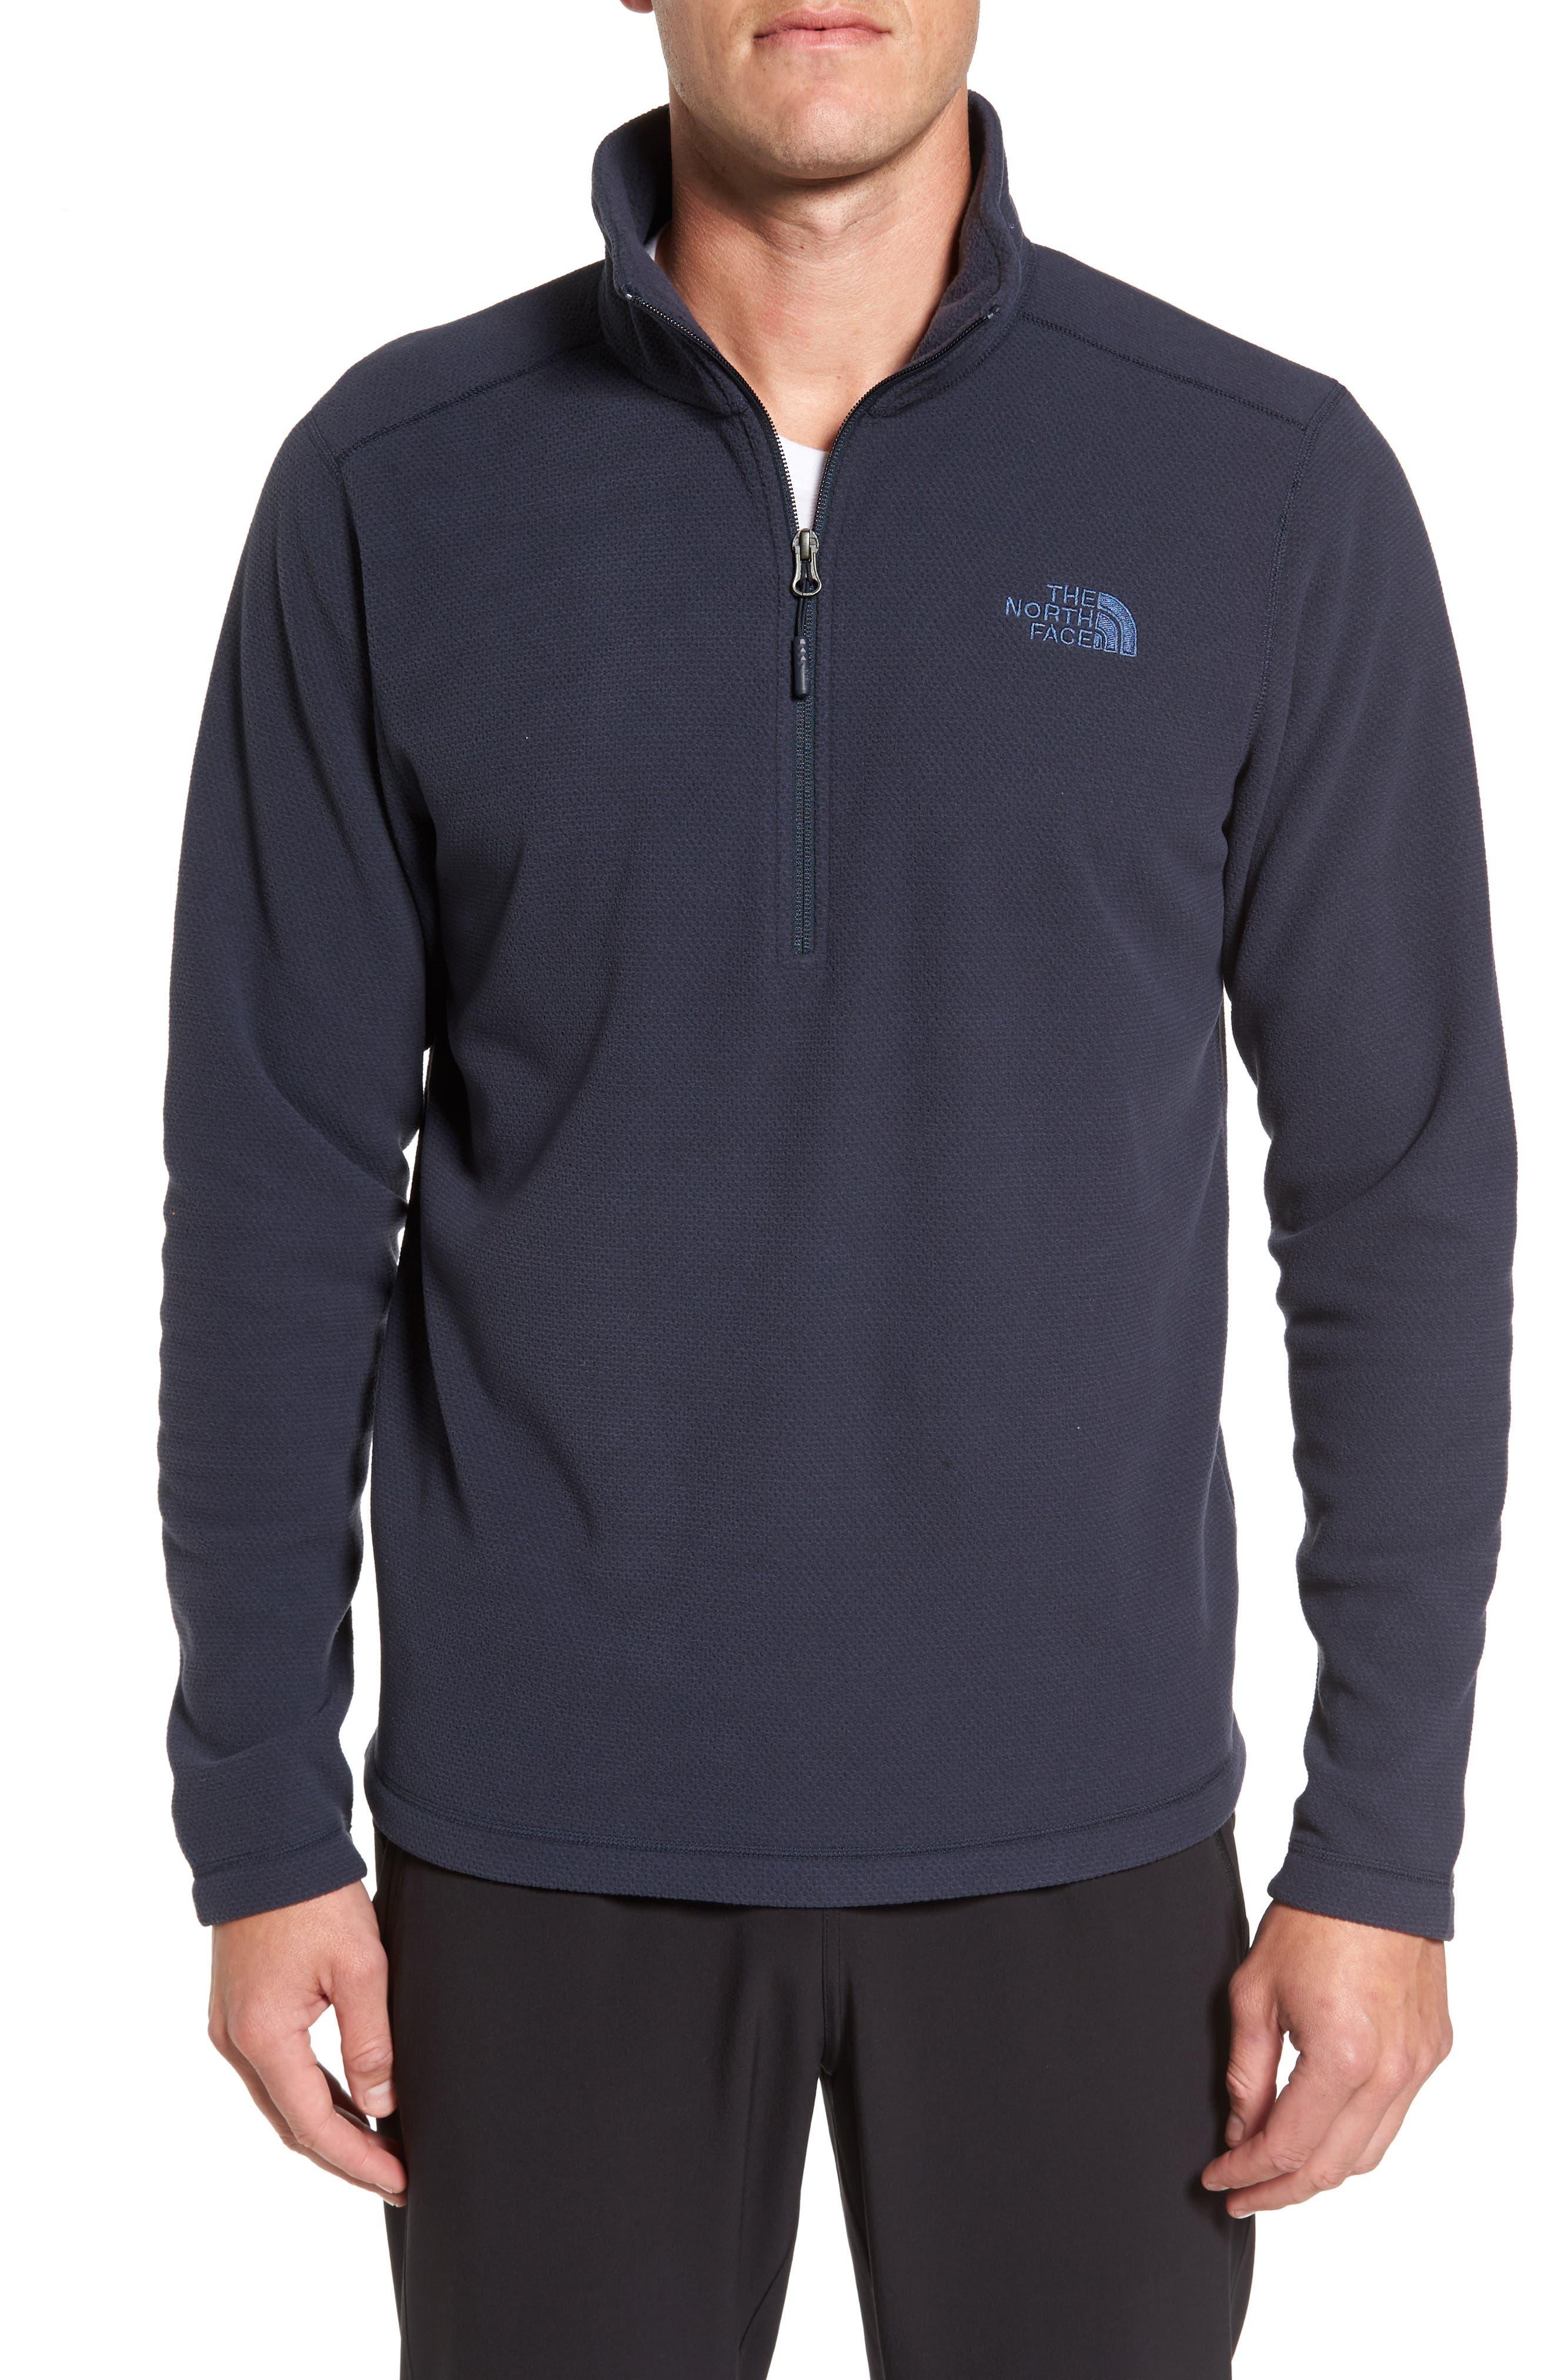 Texture Cap Rock Quarter Zip Fleece Jacket,                             Main thumbnail 1, color,                             Urban Navy Texture